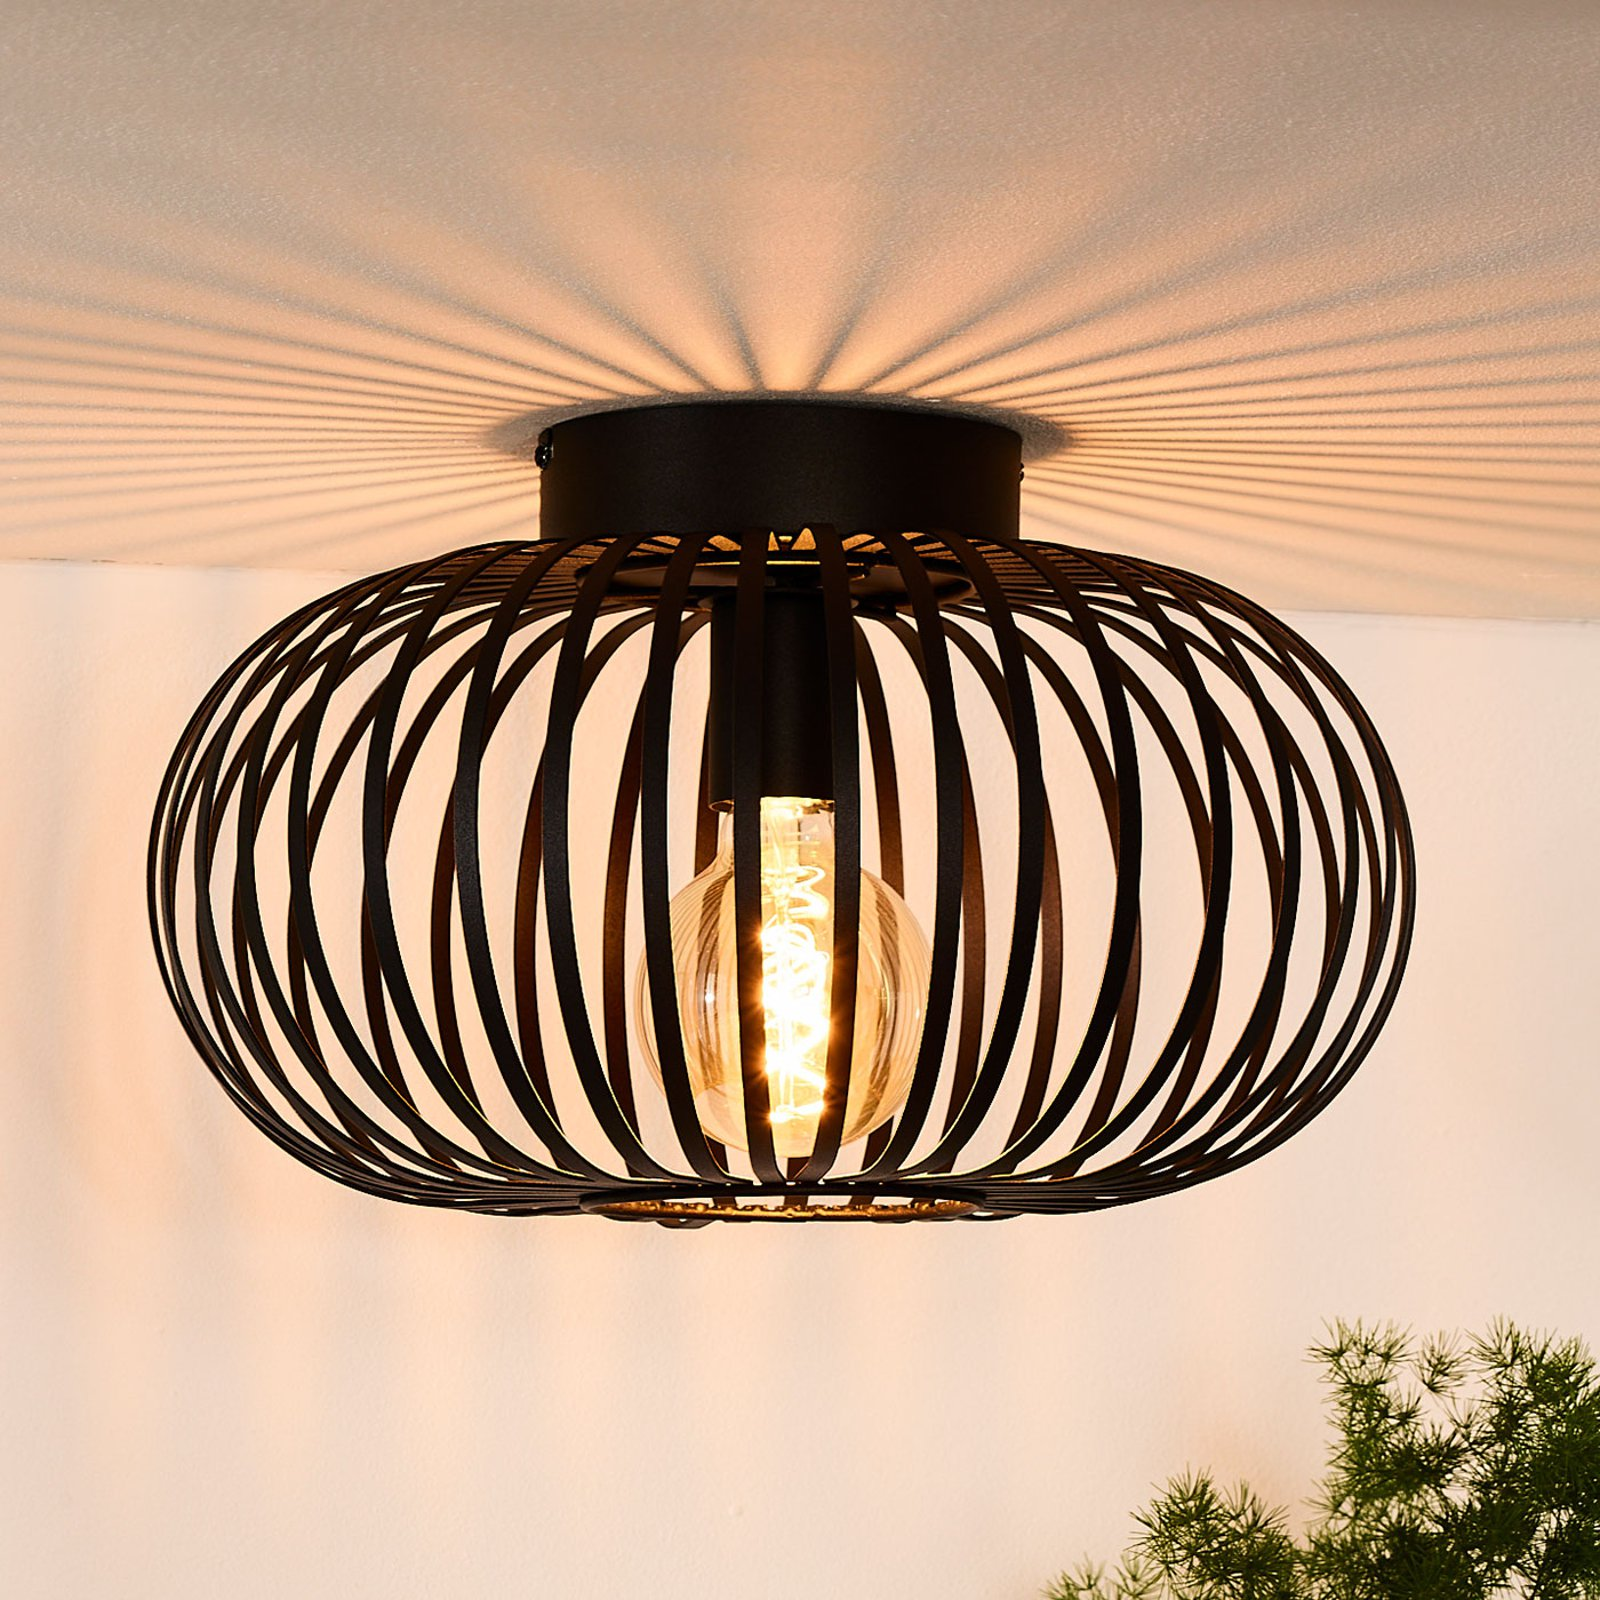 Bur-taklampe Manuela i svart, 40 cm